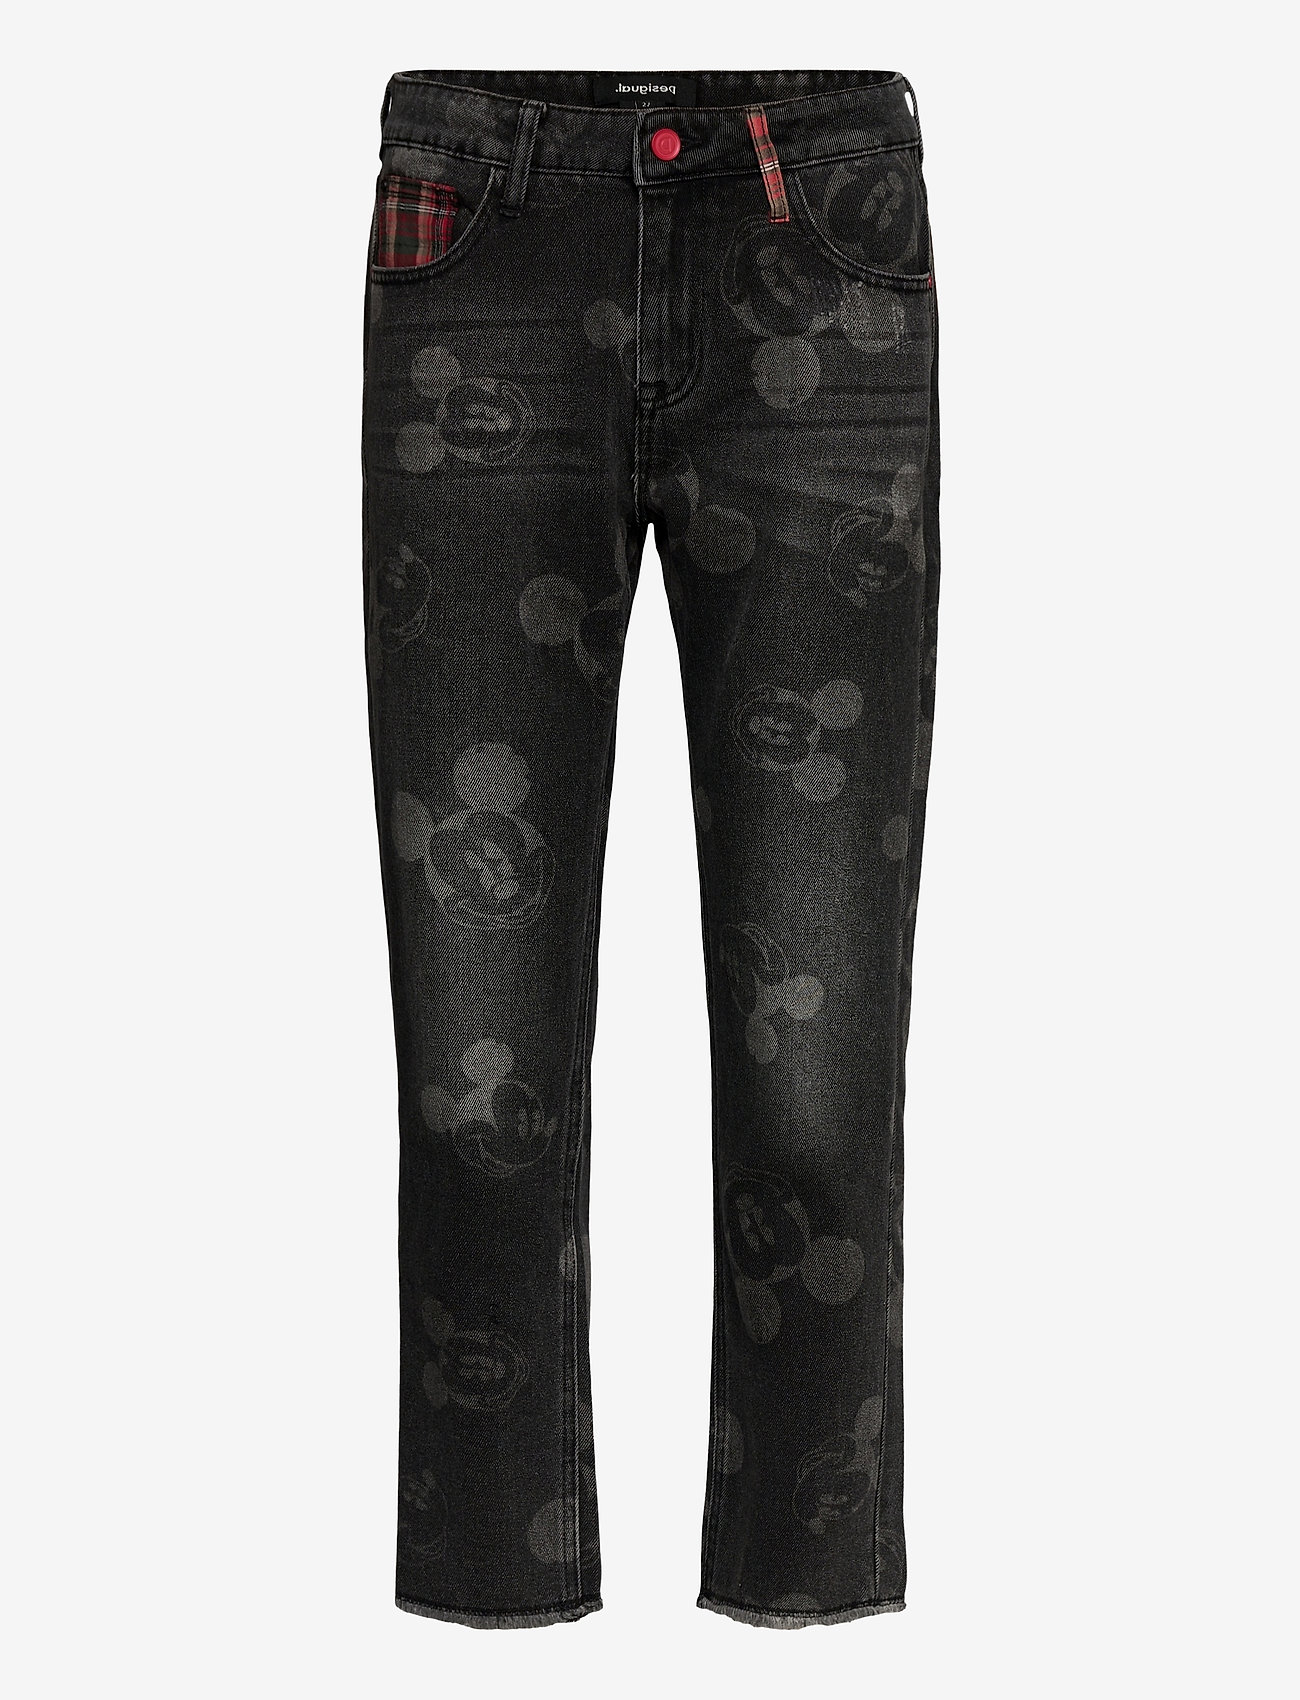 Desigual - DENIM MERY - straight jeans - denim black wash - 0